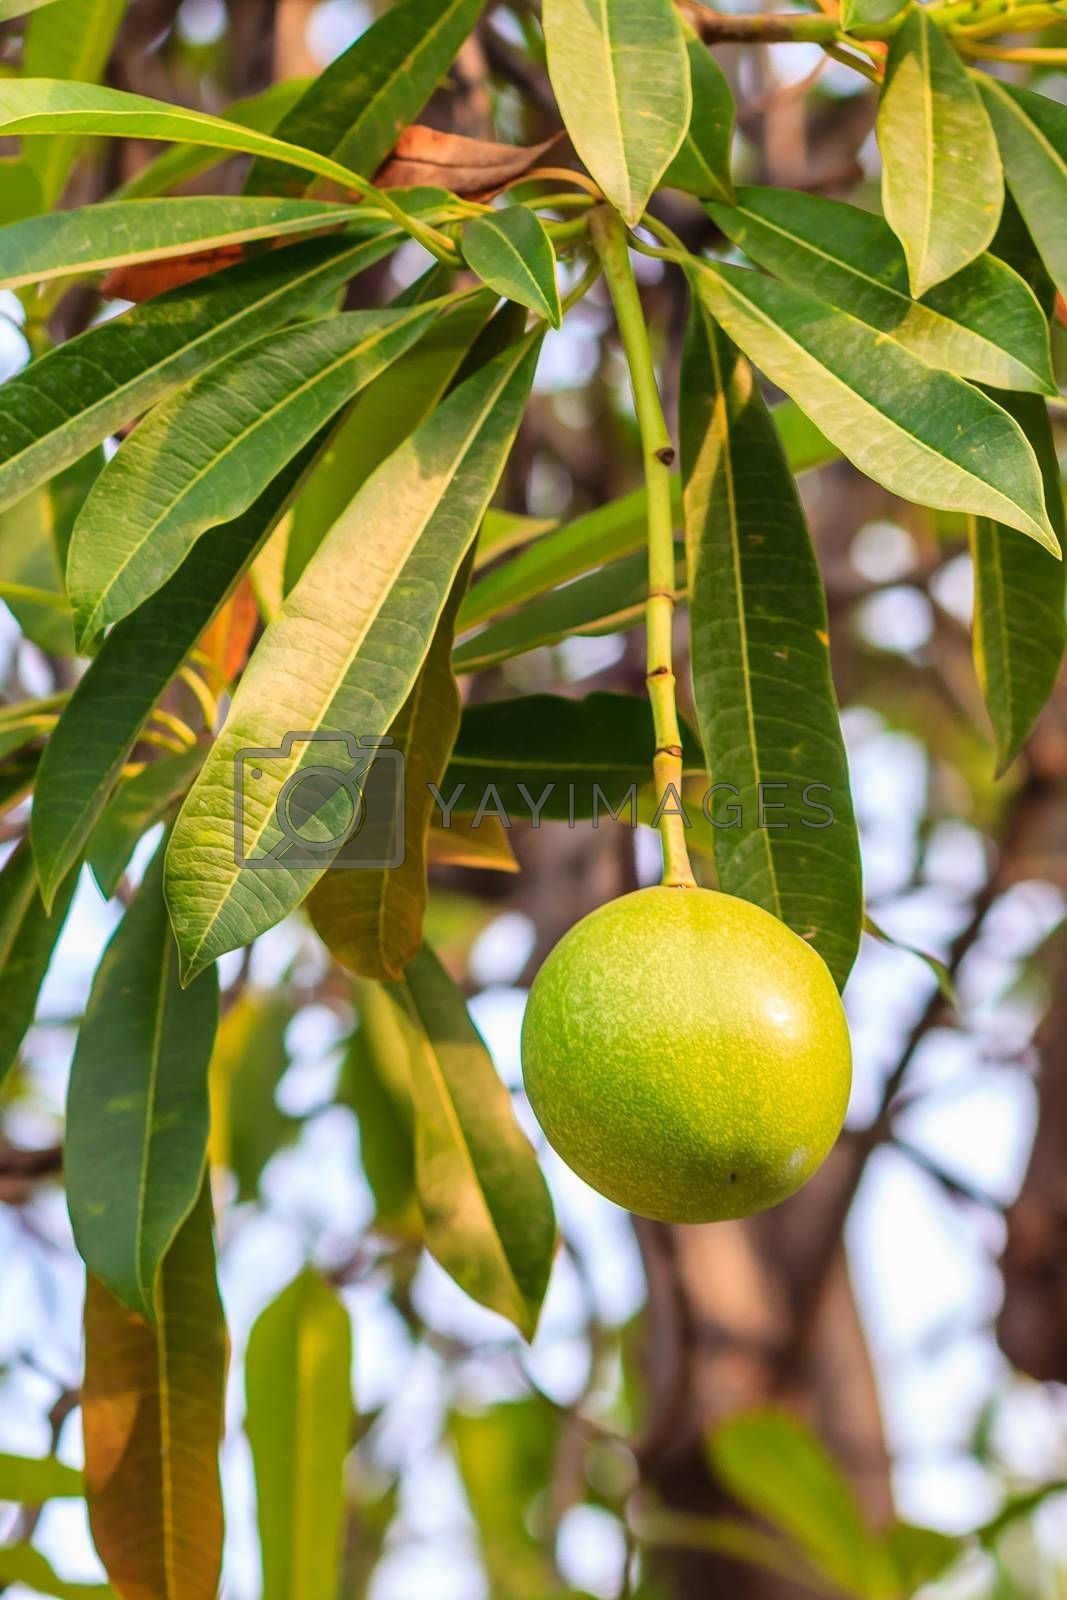 Green Suicide tree, Pong-pong, Othalanga (Cerbera oddloam) fruit on tree, cerbera odollam gaertn of apocynaceae family